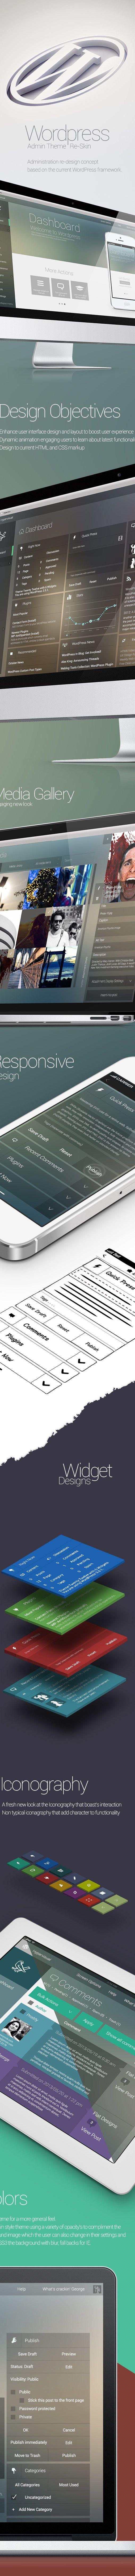 Wordpress Admin Theme Redesign by George Kordas, via Behance #wordpress